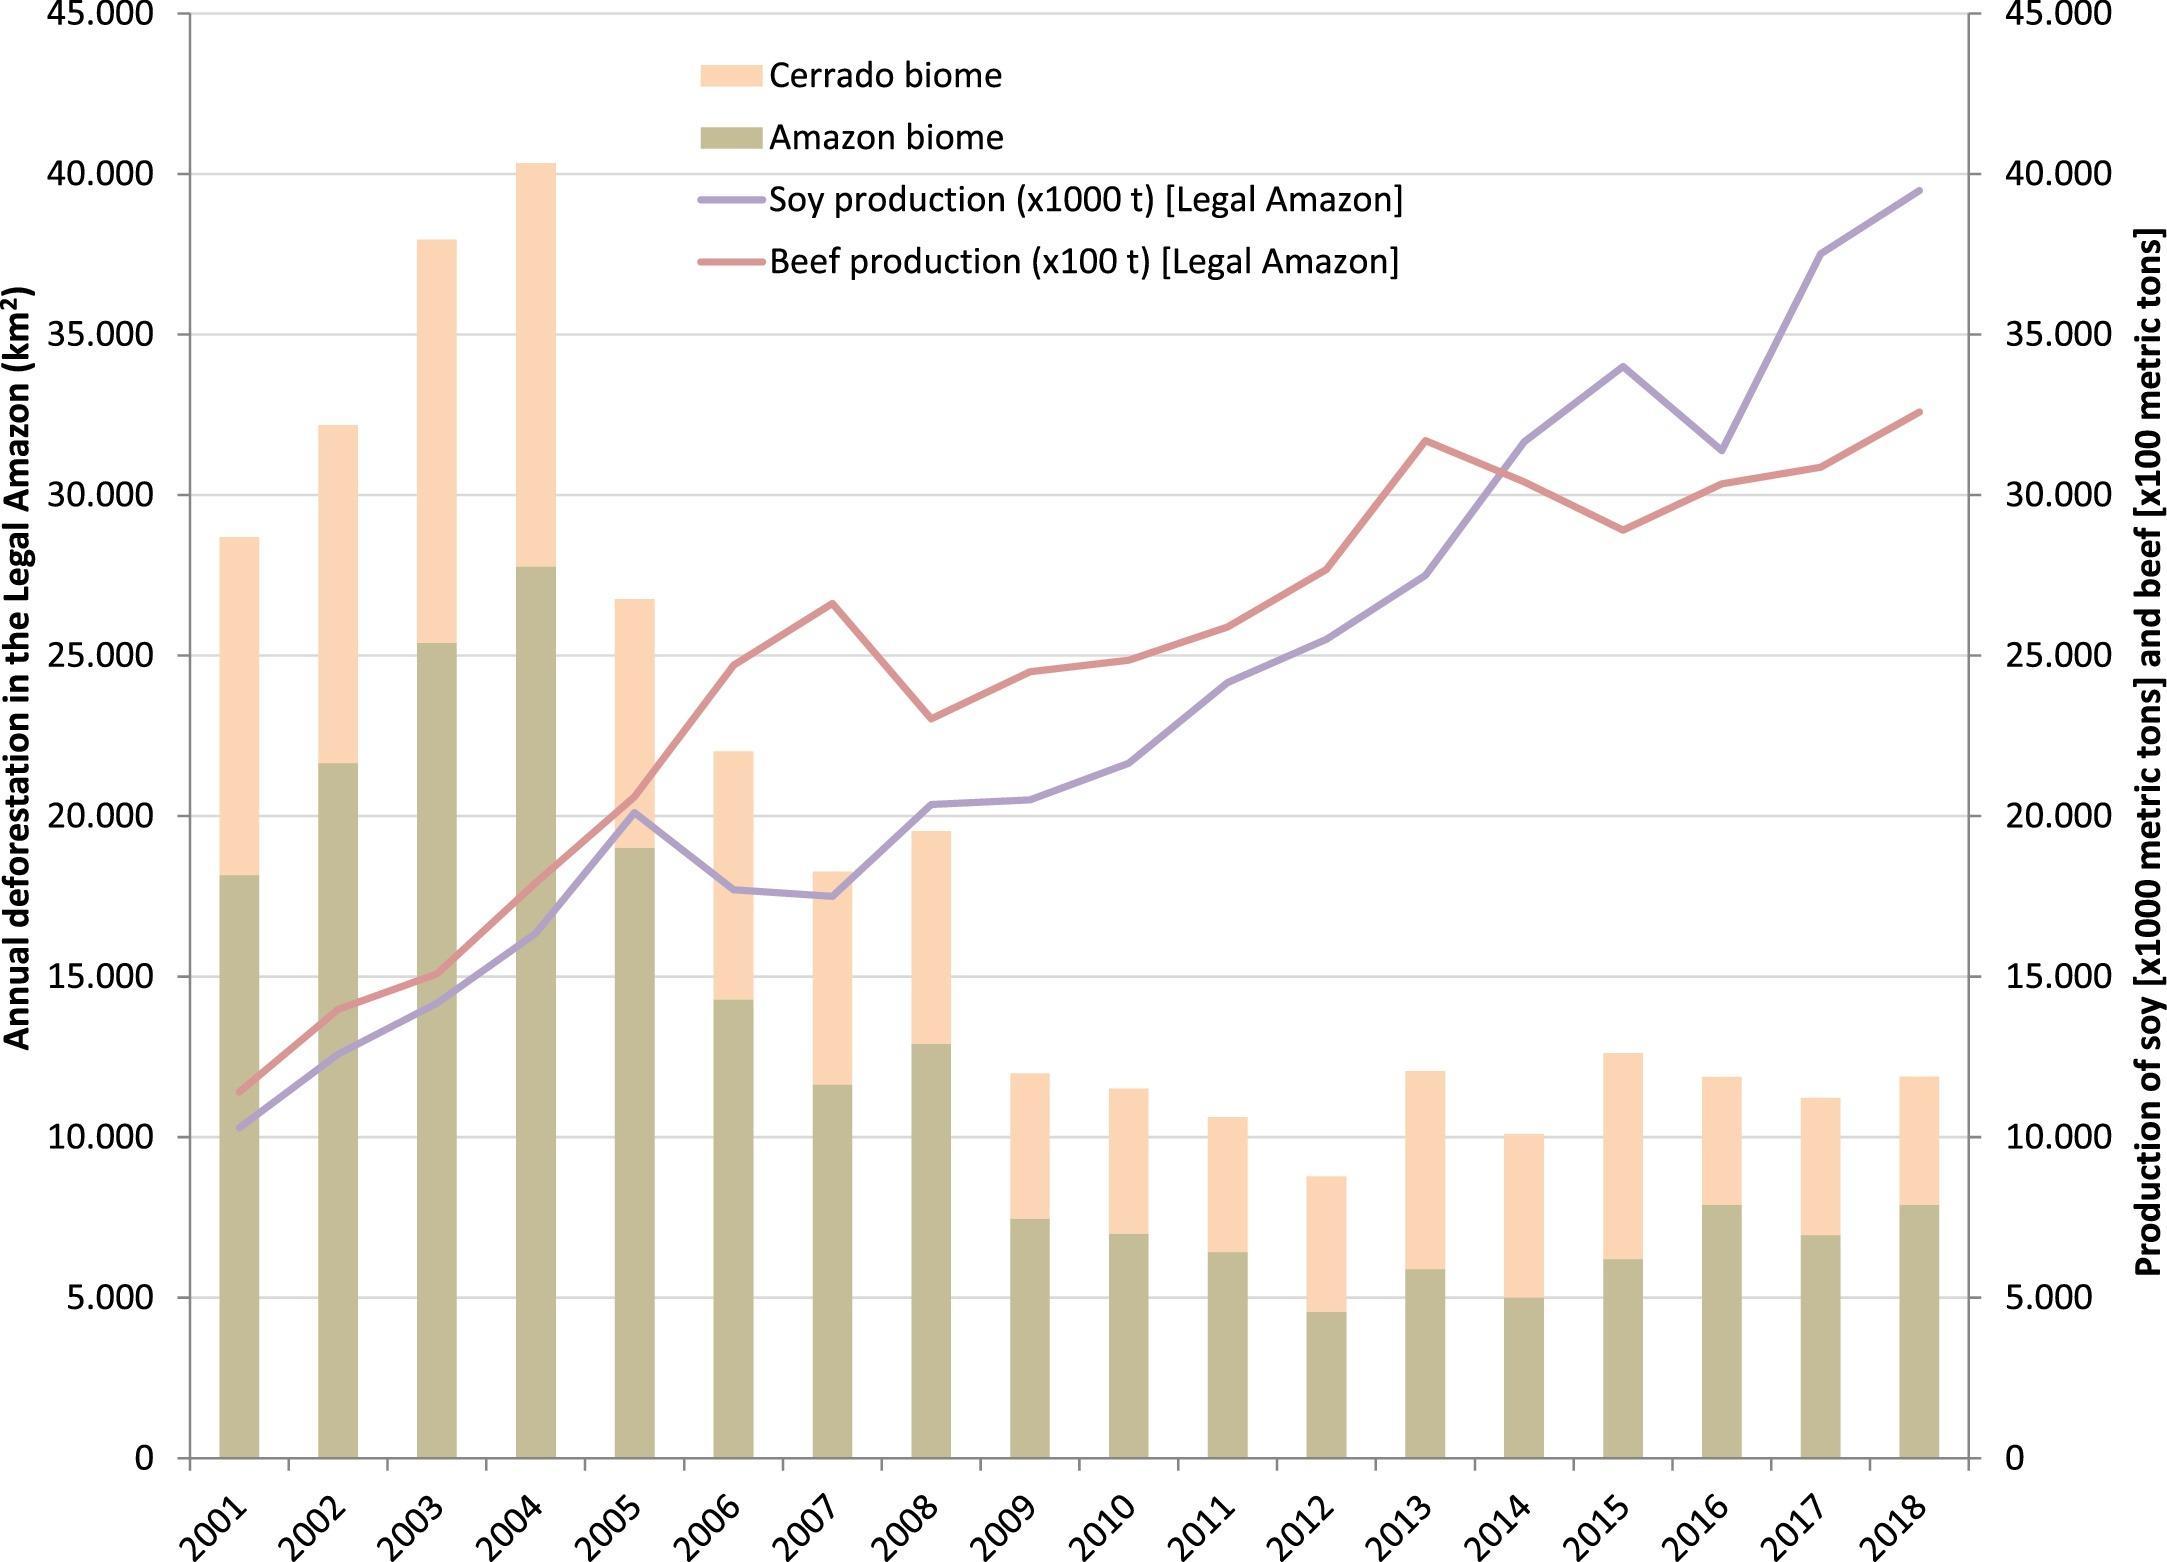 Amazon deforestation vs agriculture production chart